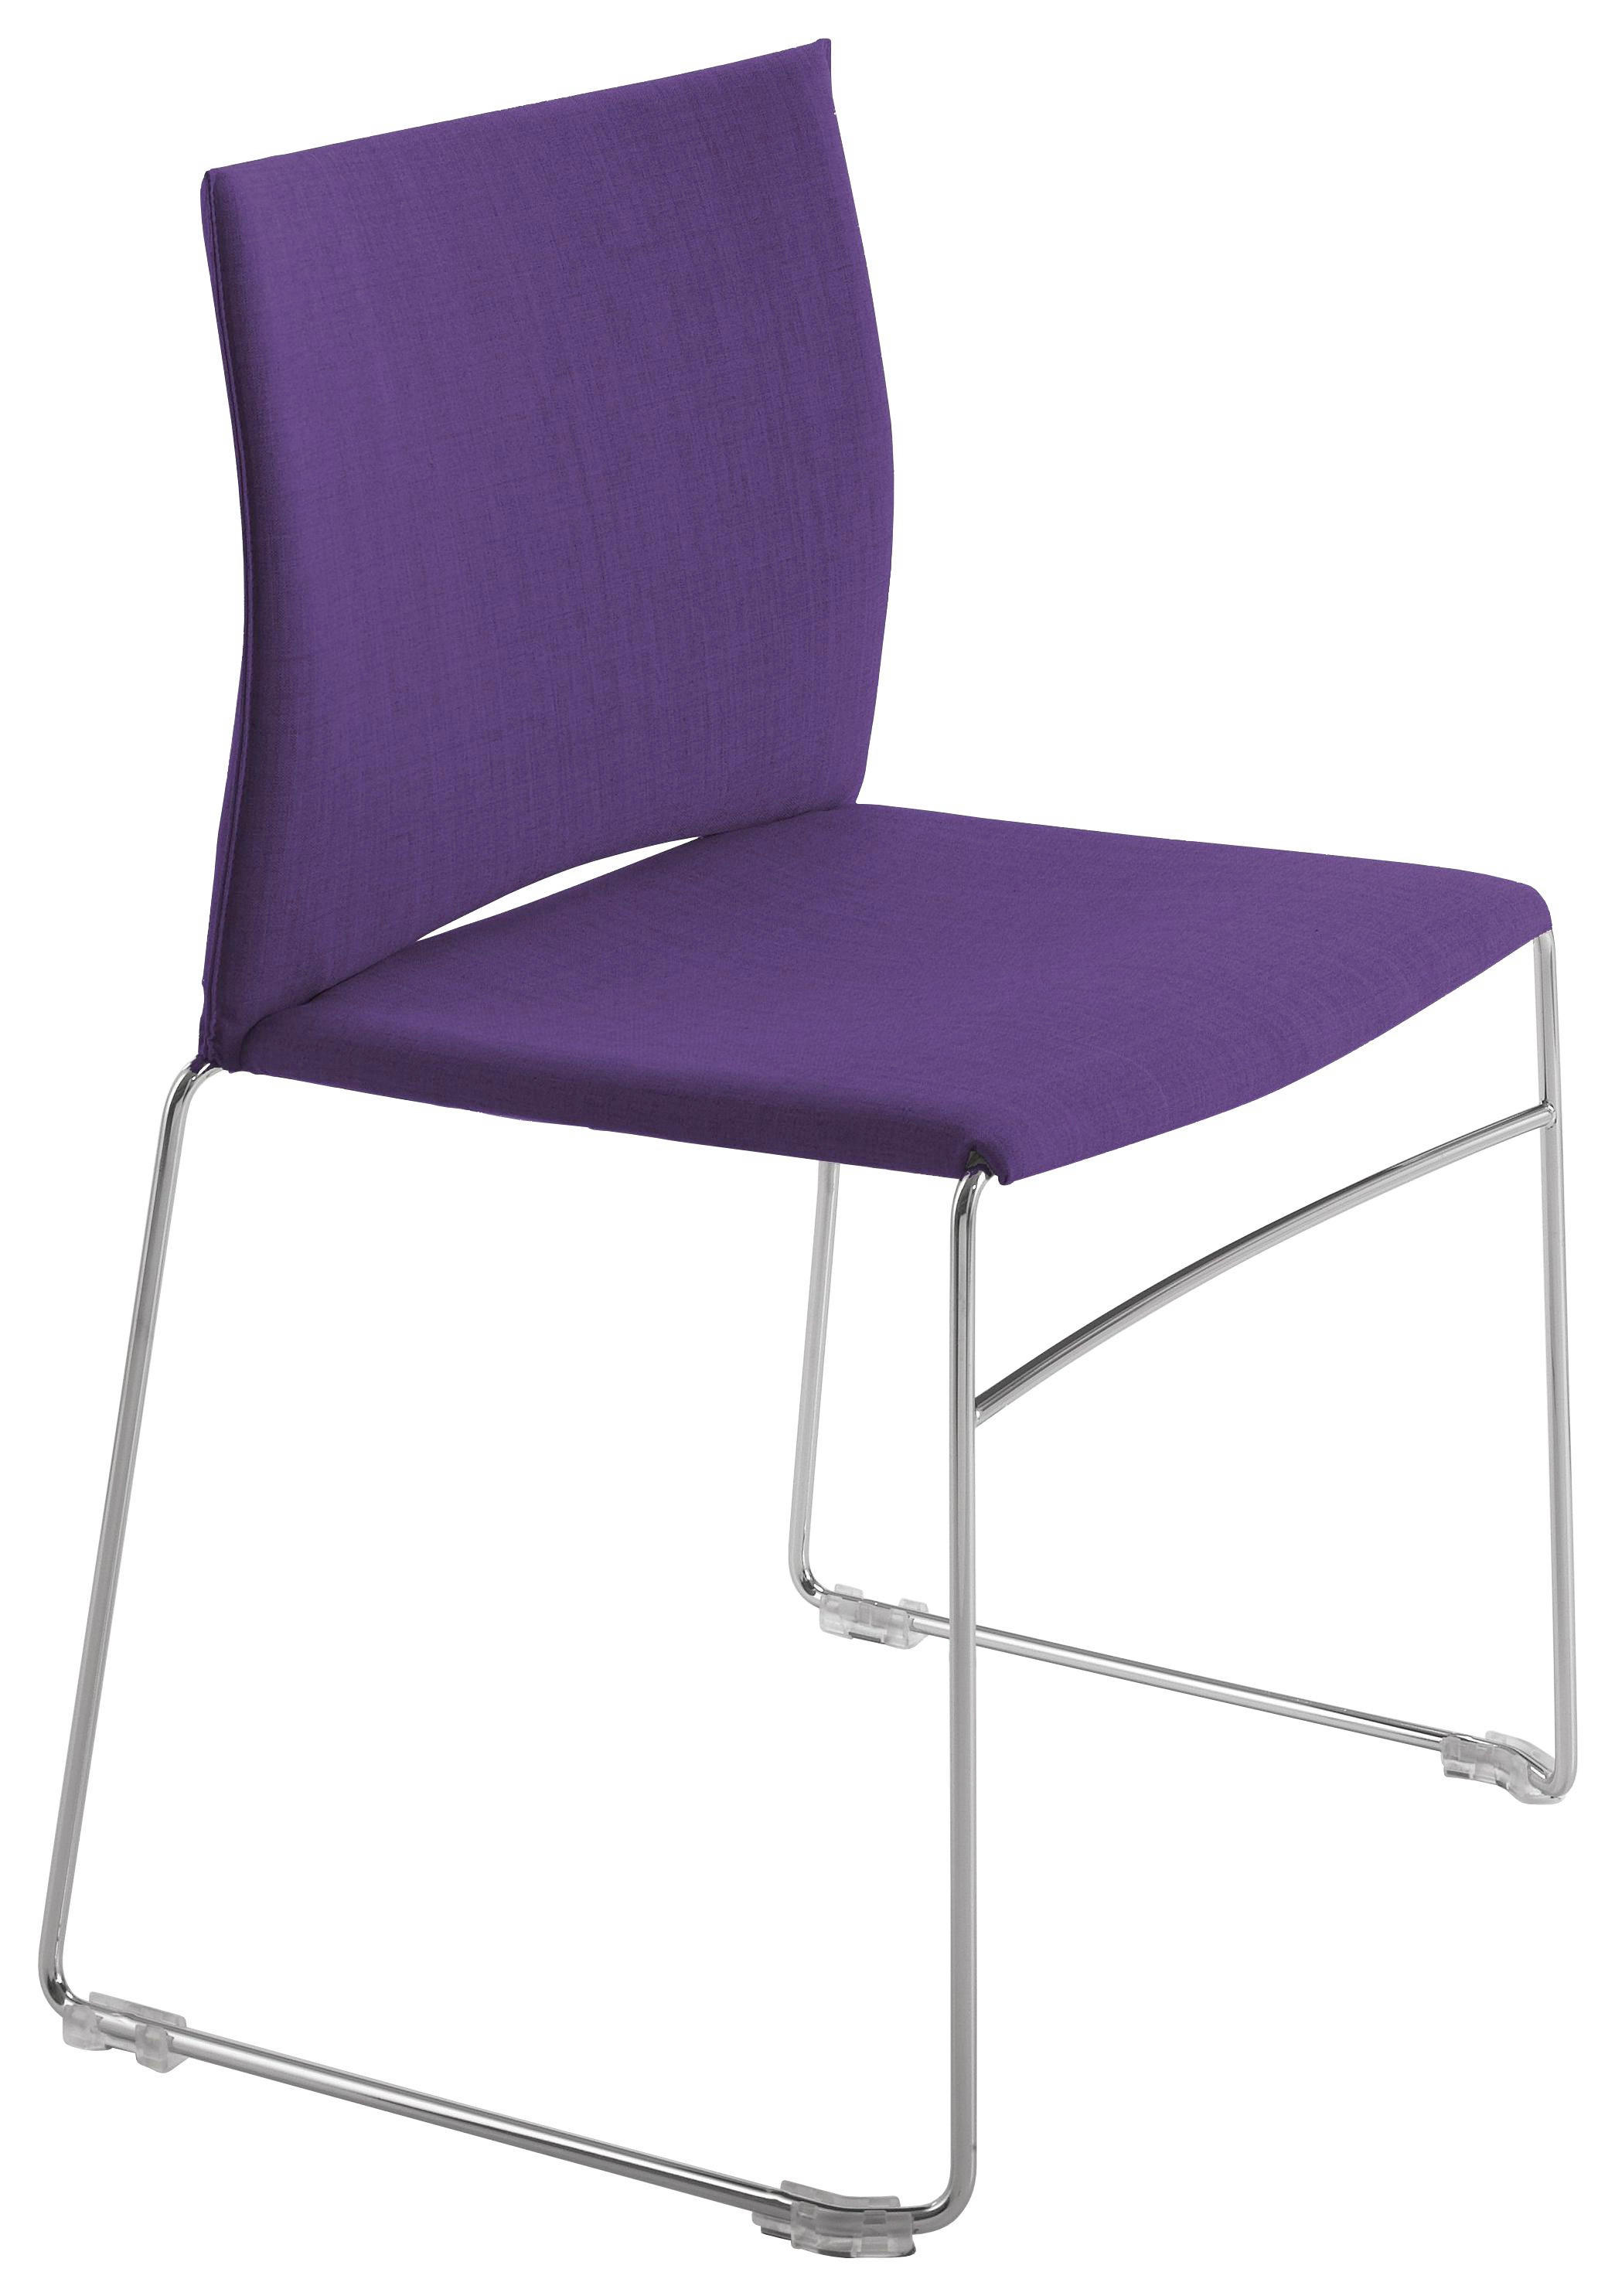 Stuhl In Metall Textil Lila Chromfarben Violett Online Kaufen